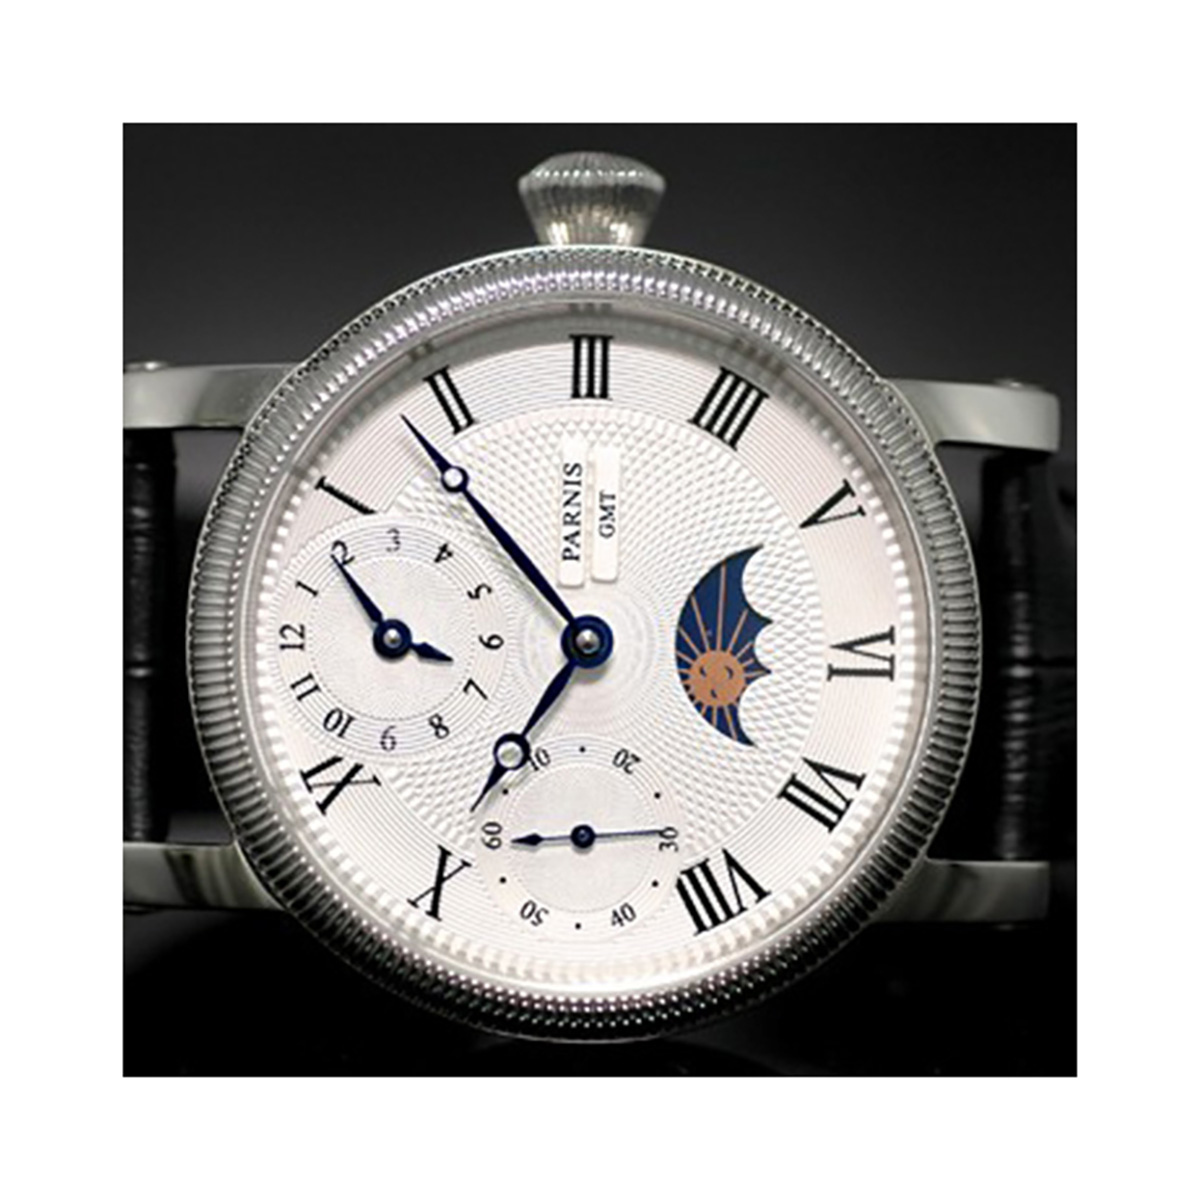 PARNIS パーニス 手巻き 腕時計 メンズ [PN-120S5ML] 並行輸入品 当店保証24ヵ月